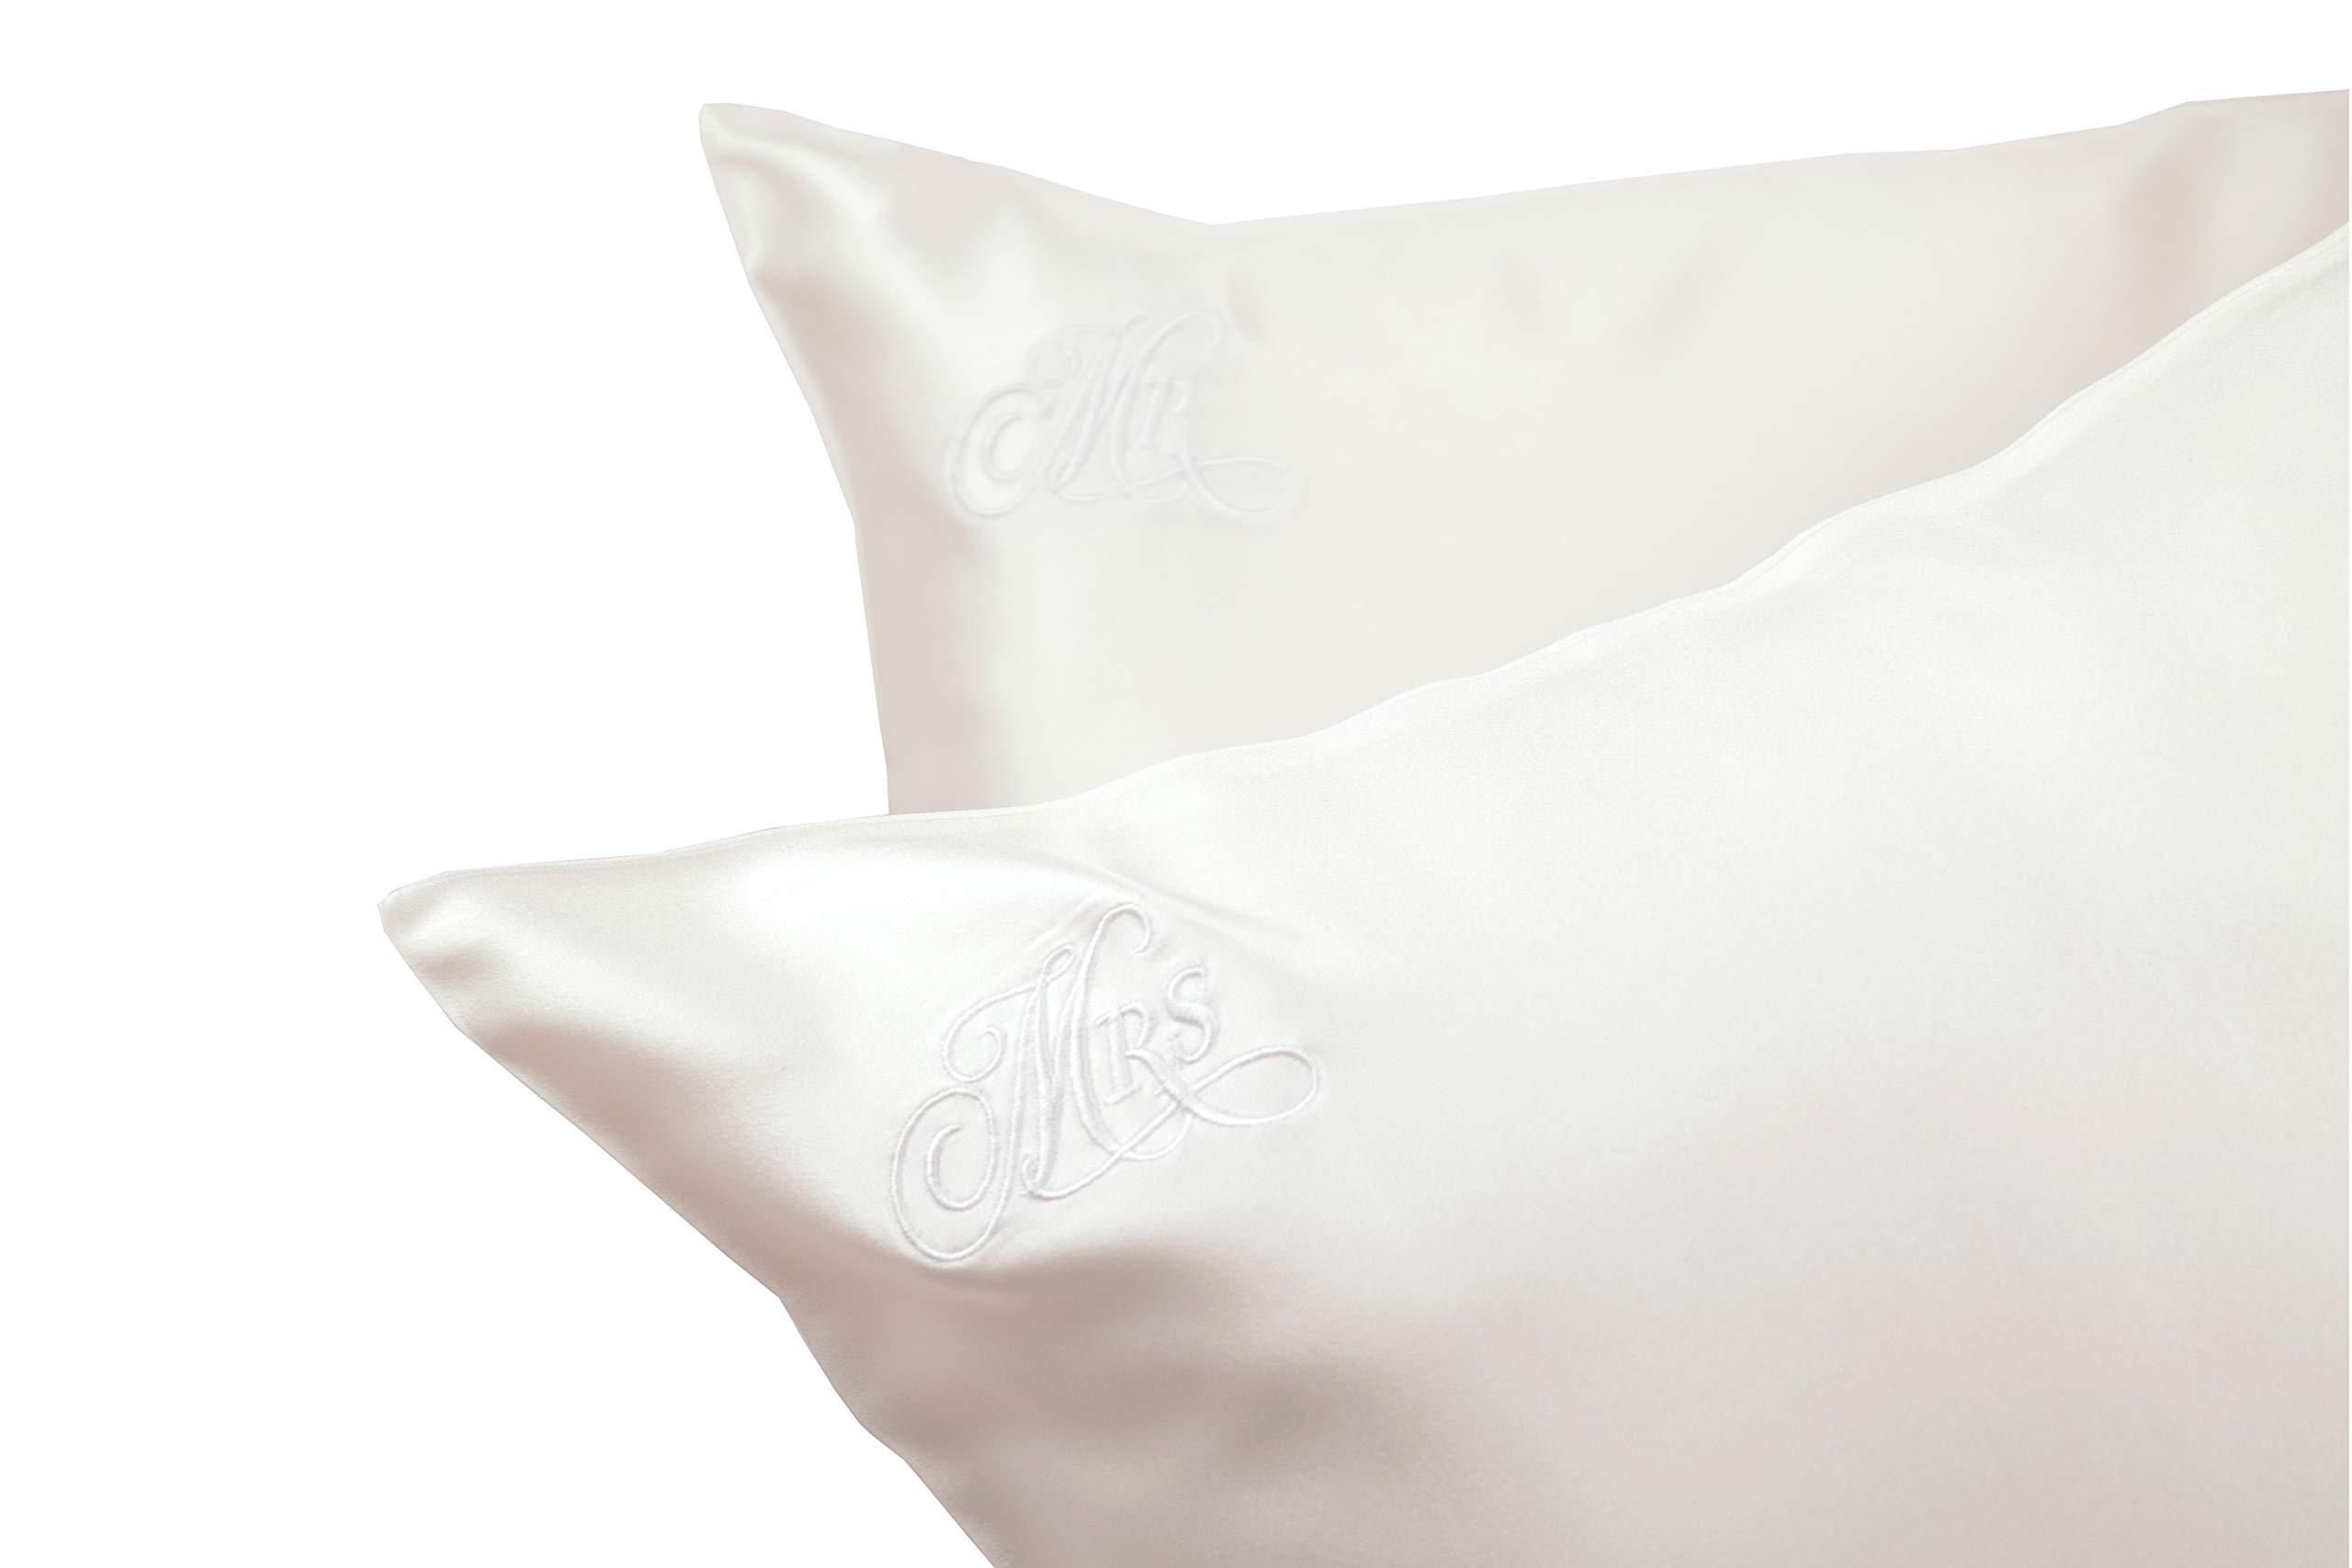 Celestial Silk Mr and Mrs Pillowcase Set, Embroidered Silk Pillowcases Wedding, (Queen 20x30)